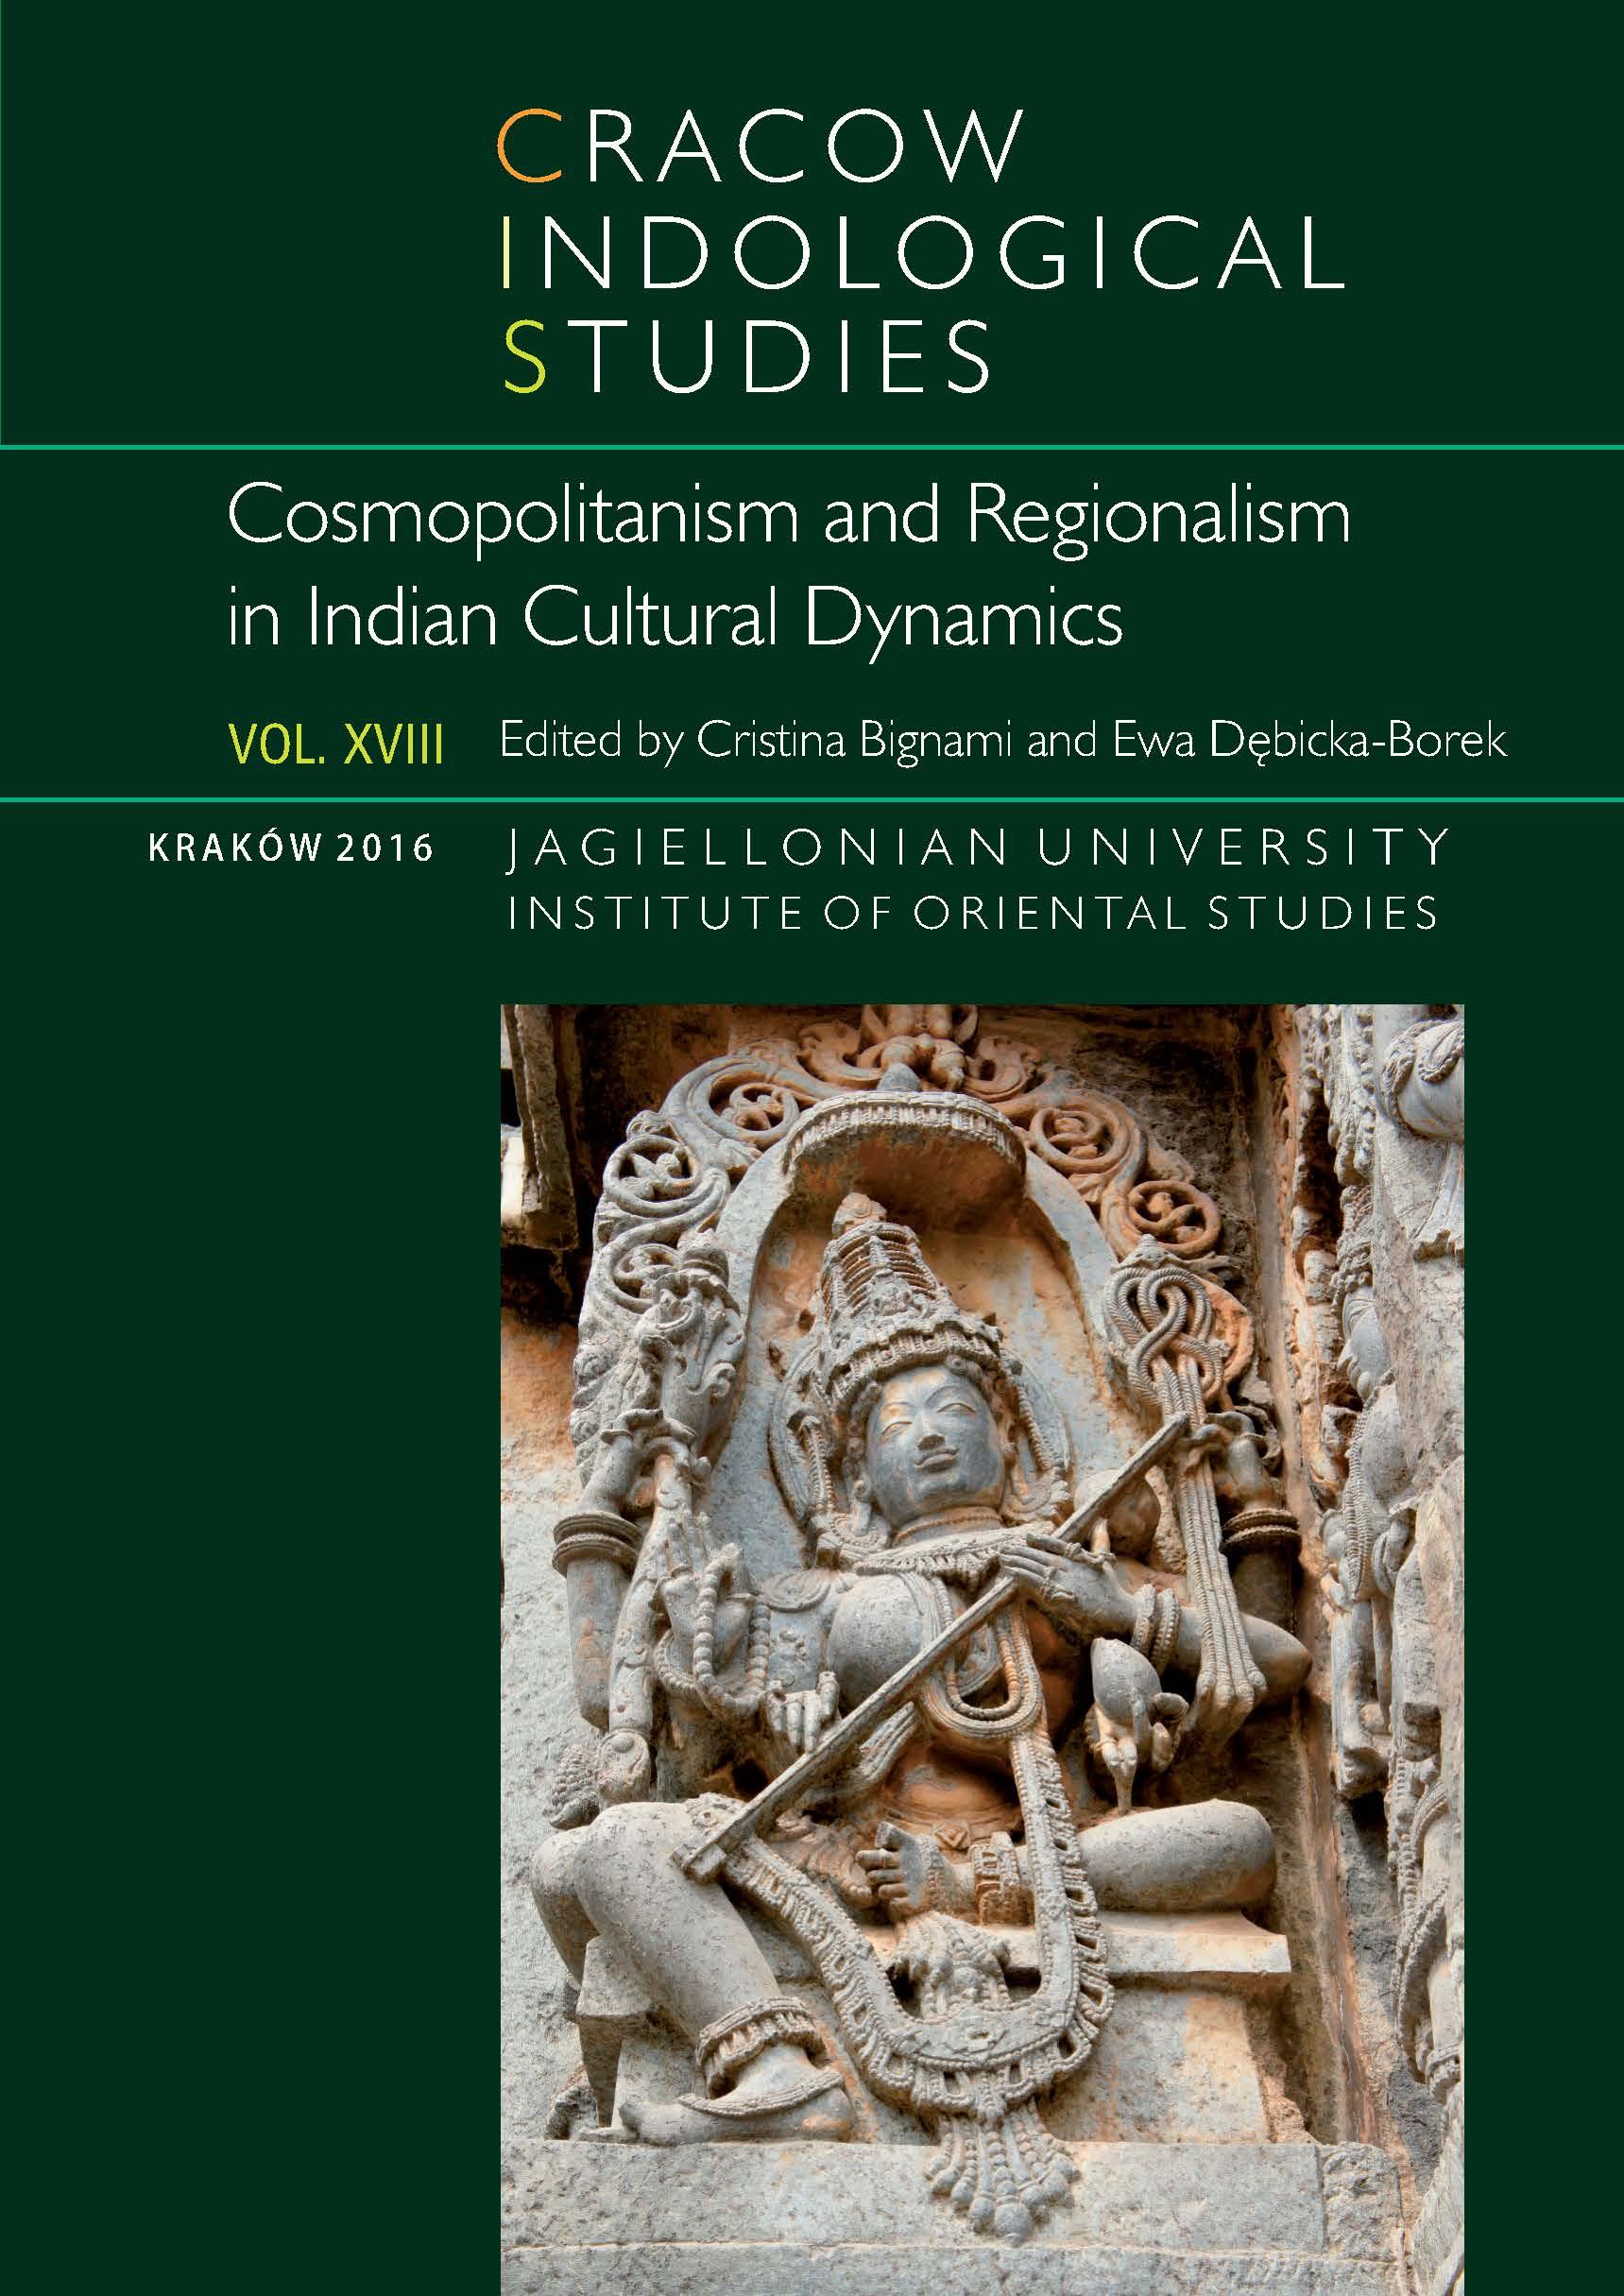 View Vol. 18 (2016): Cosmopolitanism and Regionalism in Indian Cultural Dynamics